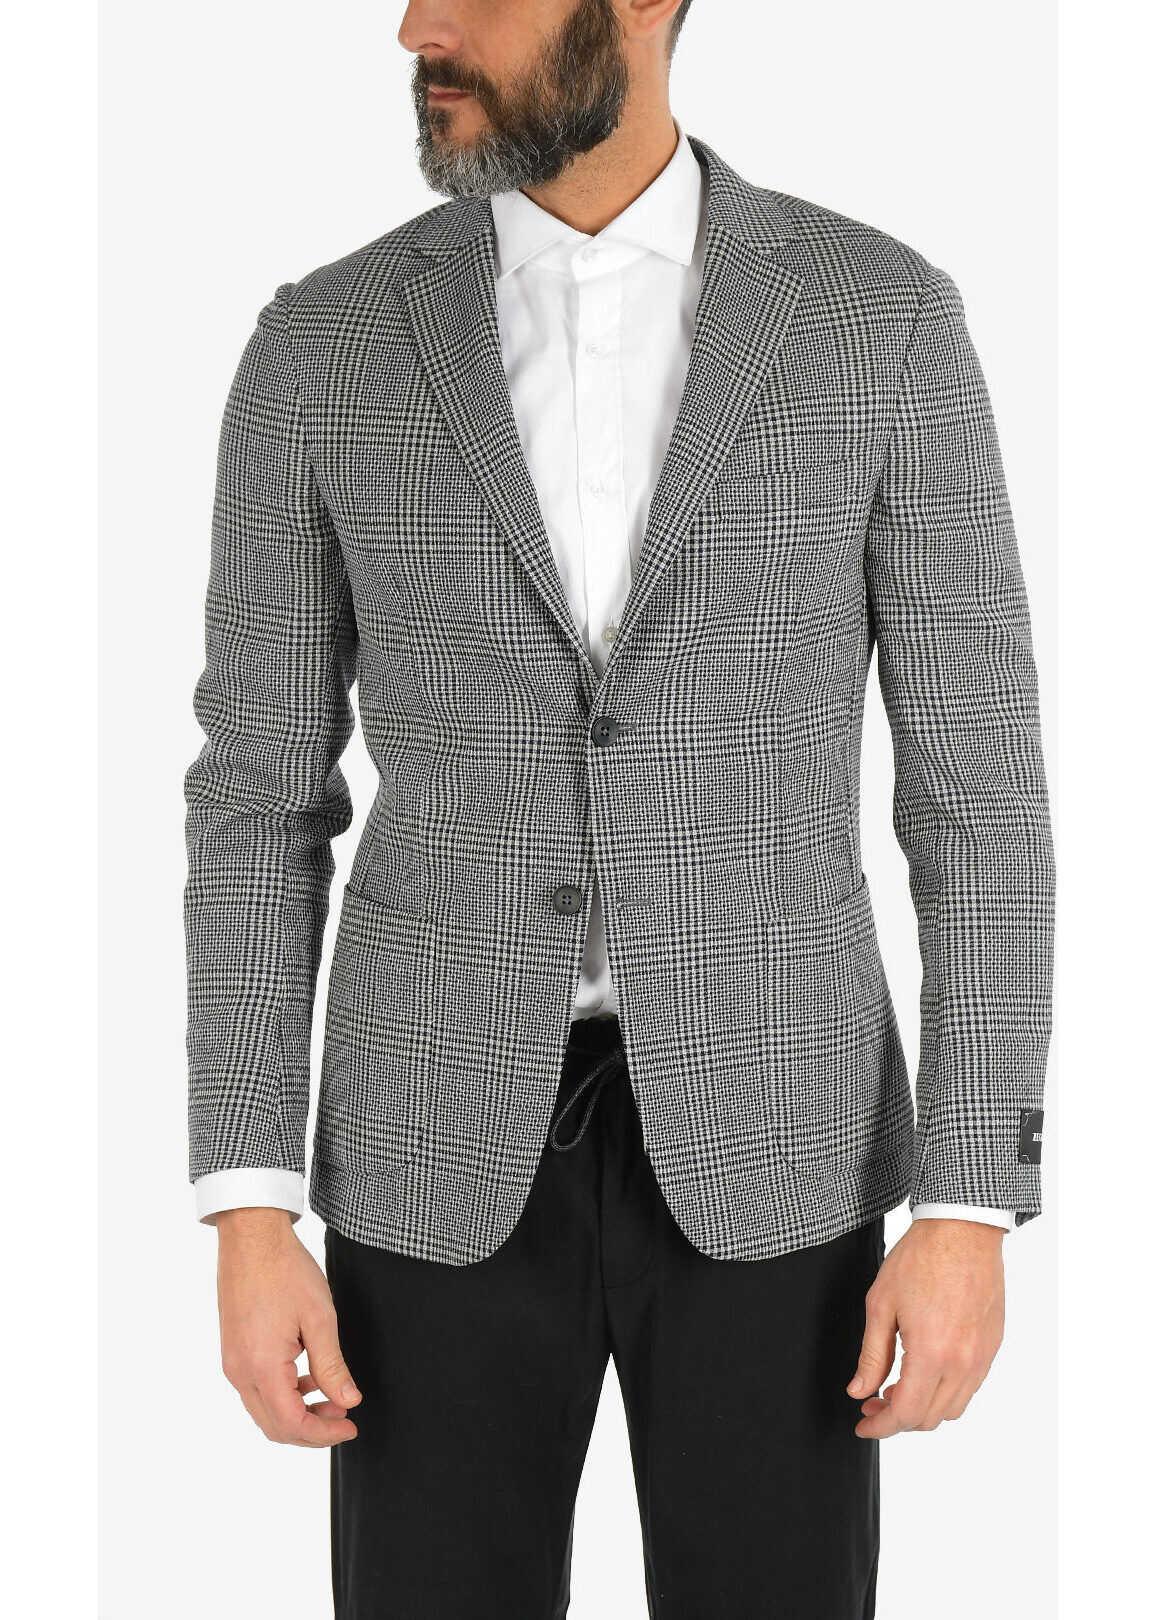 Ermenegildo Zegna ZZEGNA Wool Two Button Blazer with Notch Lapels BLACK imagine